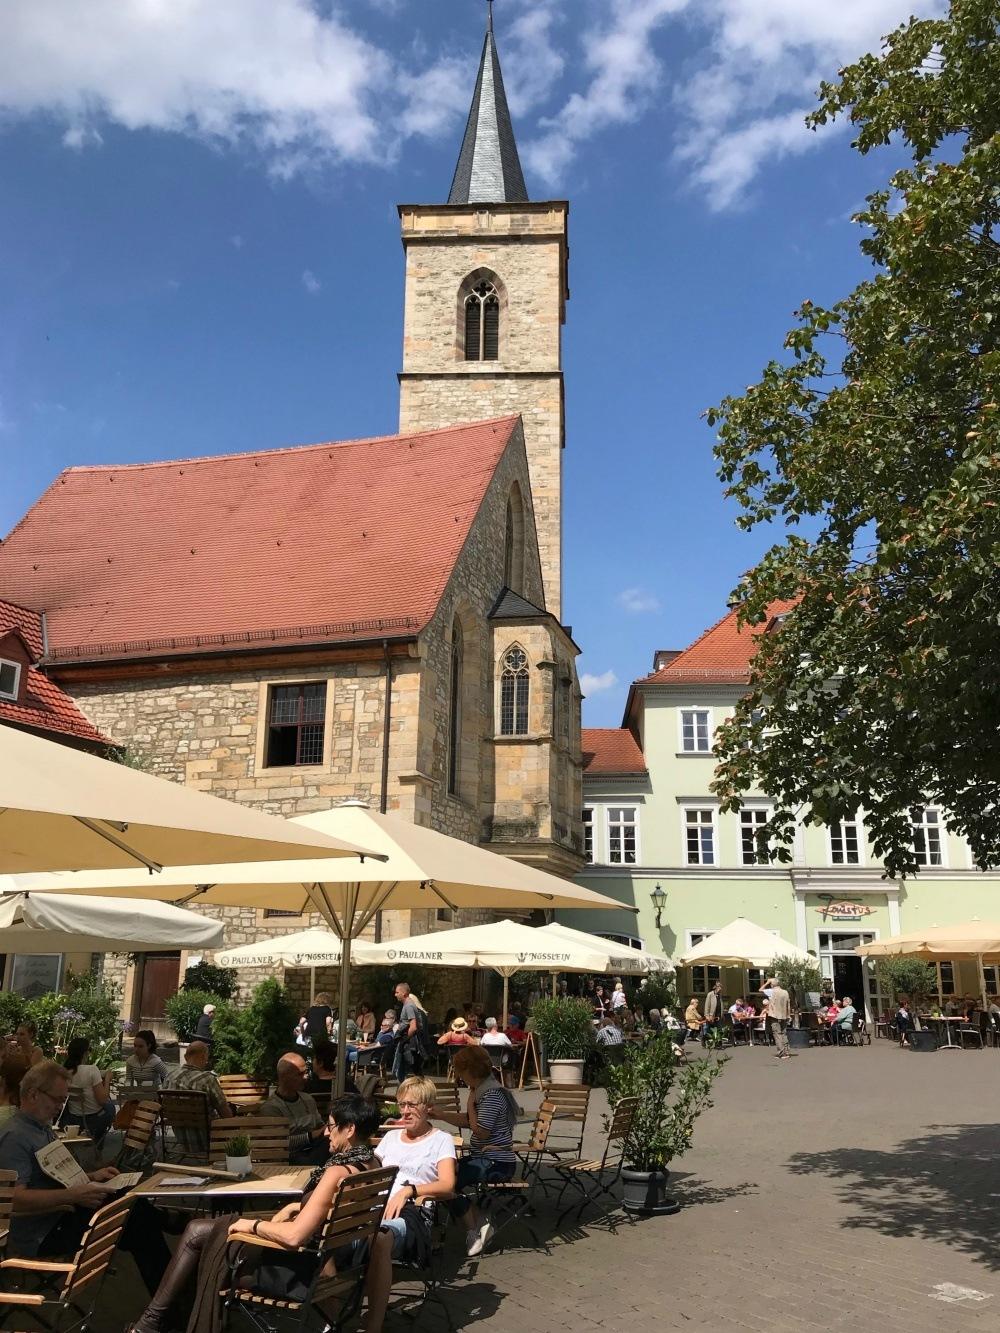 Church Tower in Erfurt, Thuringia, Germany Photo Heatheronhertravels.com